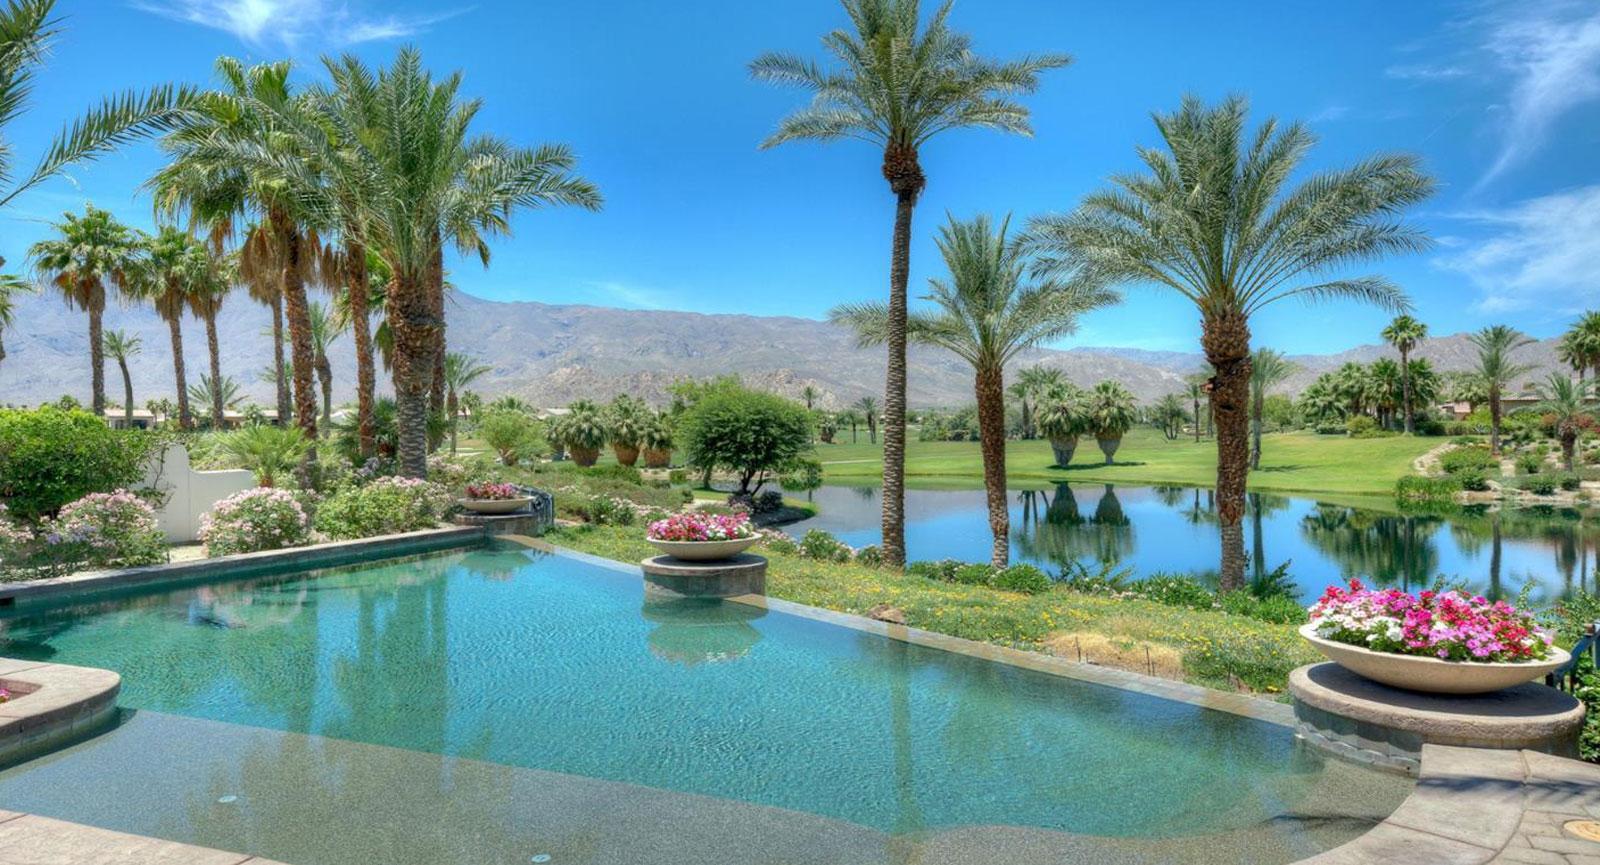 Homes For Sale in La Quinta CA